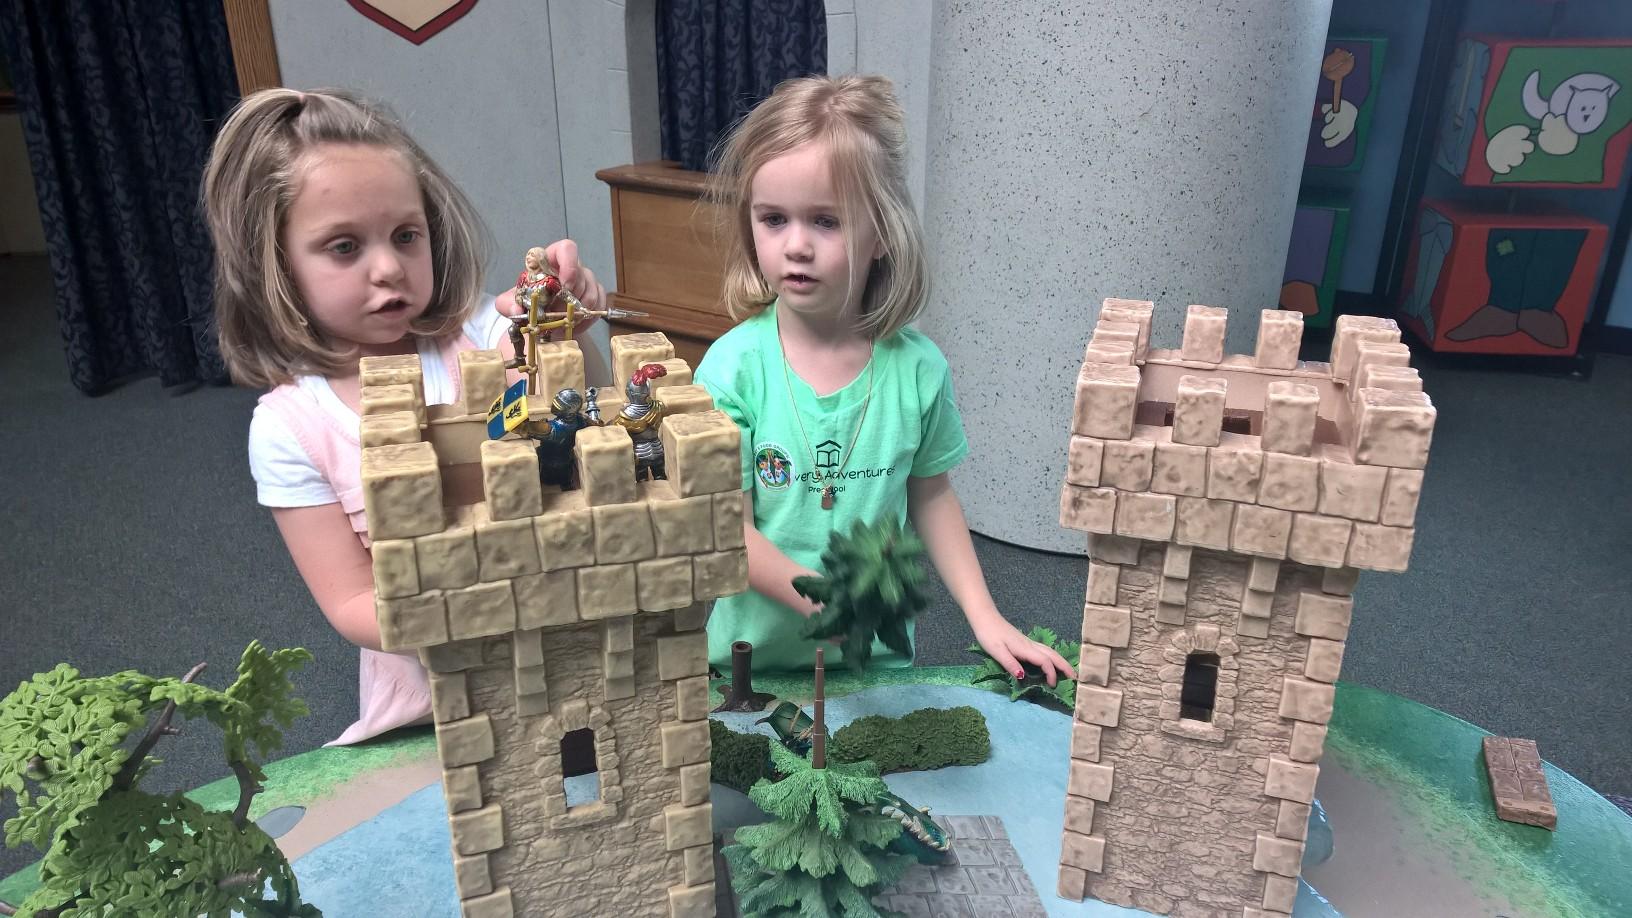 Fun at the Castle!